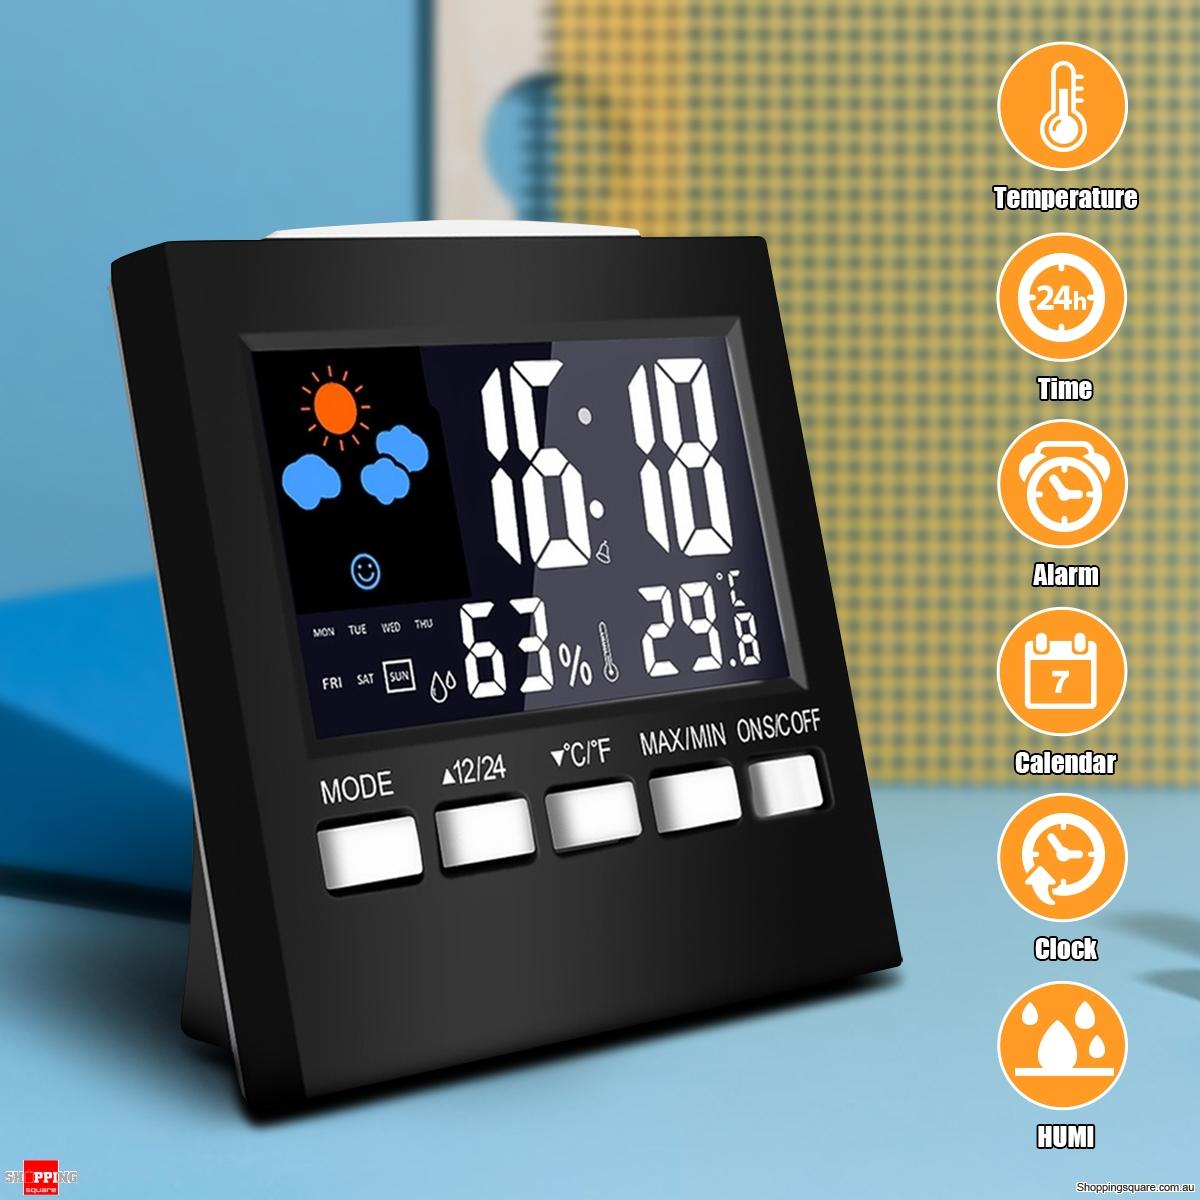 LCD Digital Thermometer Hygrometer Temperature Humidity Meter Alarm Desk Clock